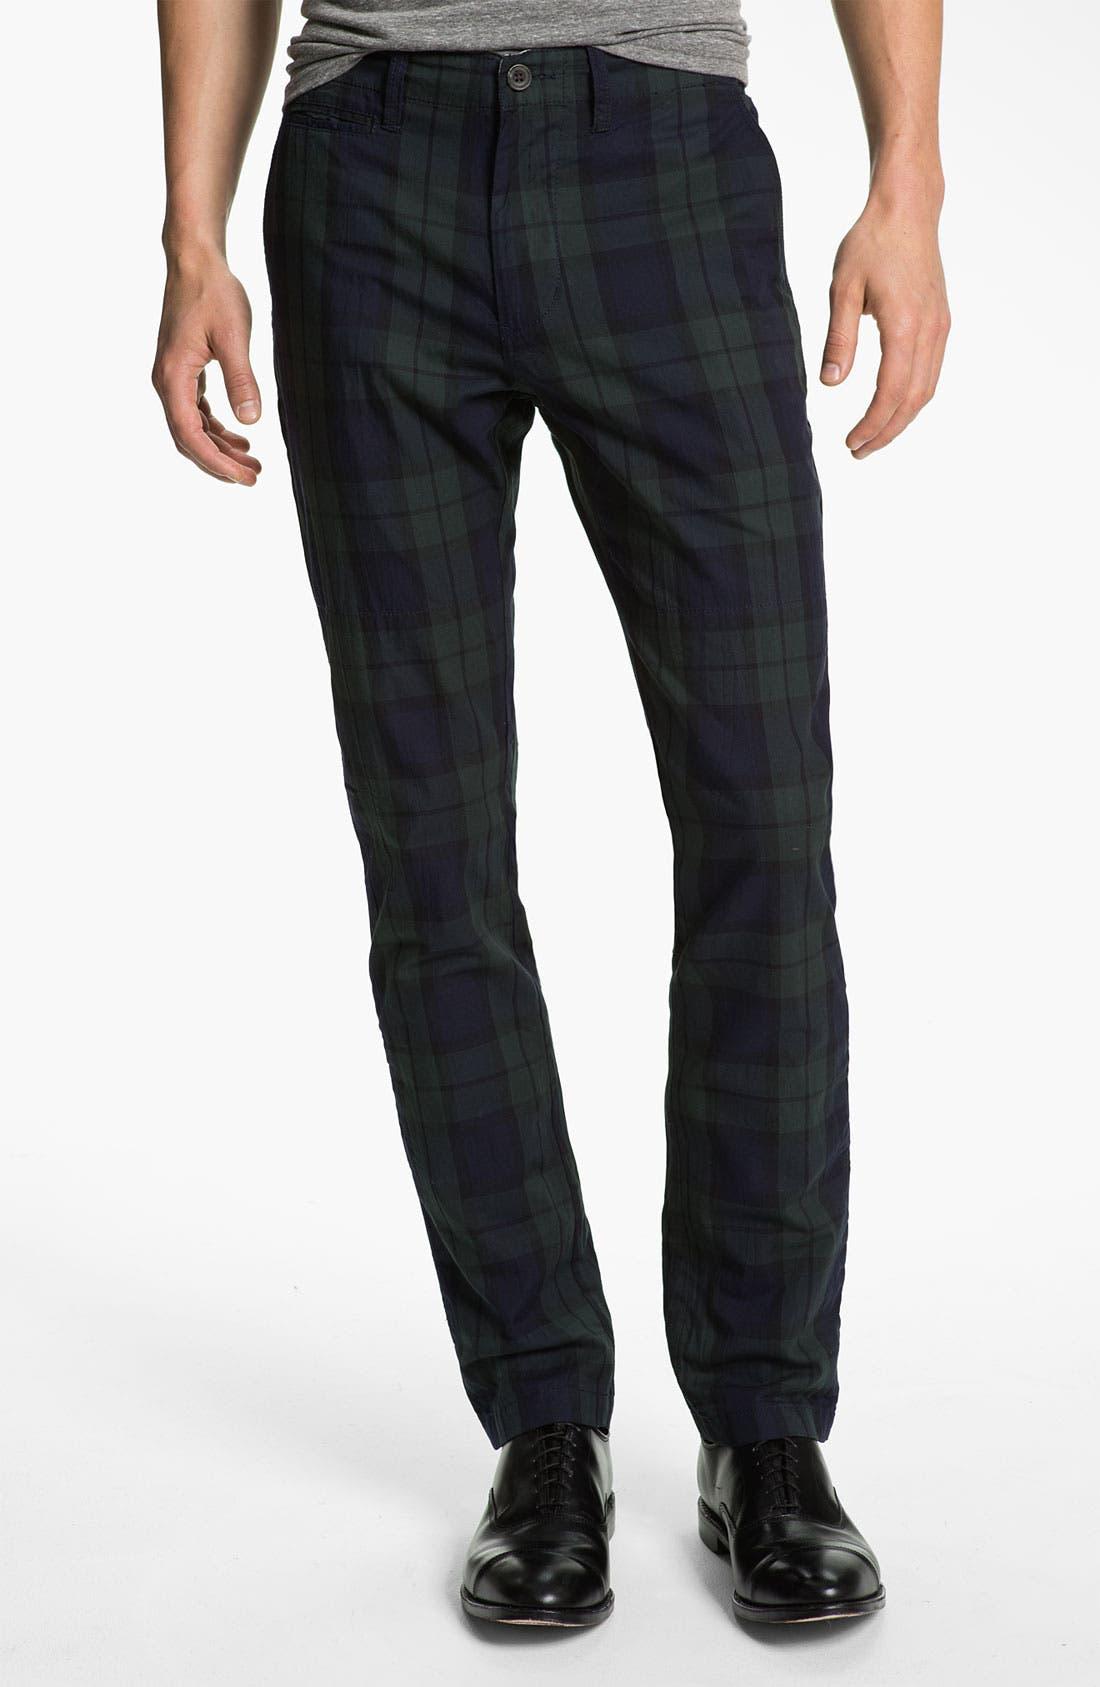 Alternate Image 1 Selected - Just A Cheap Shirt Tartan Plaid Slim Straight Leg Chinos